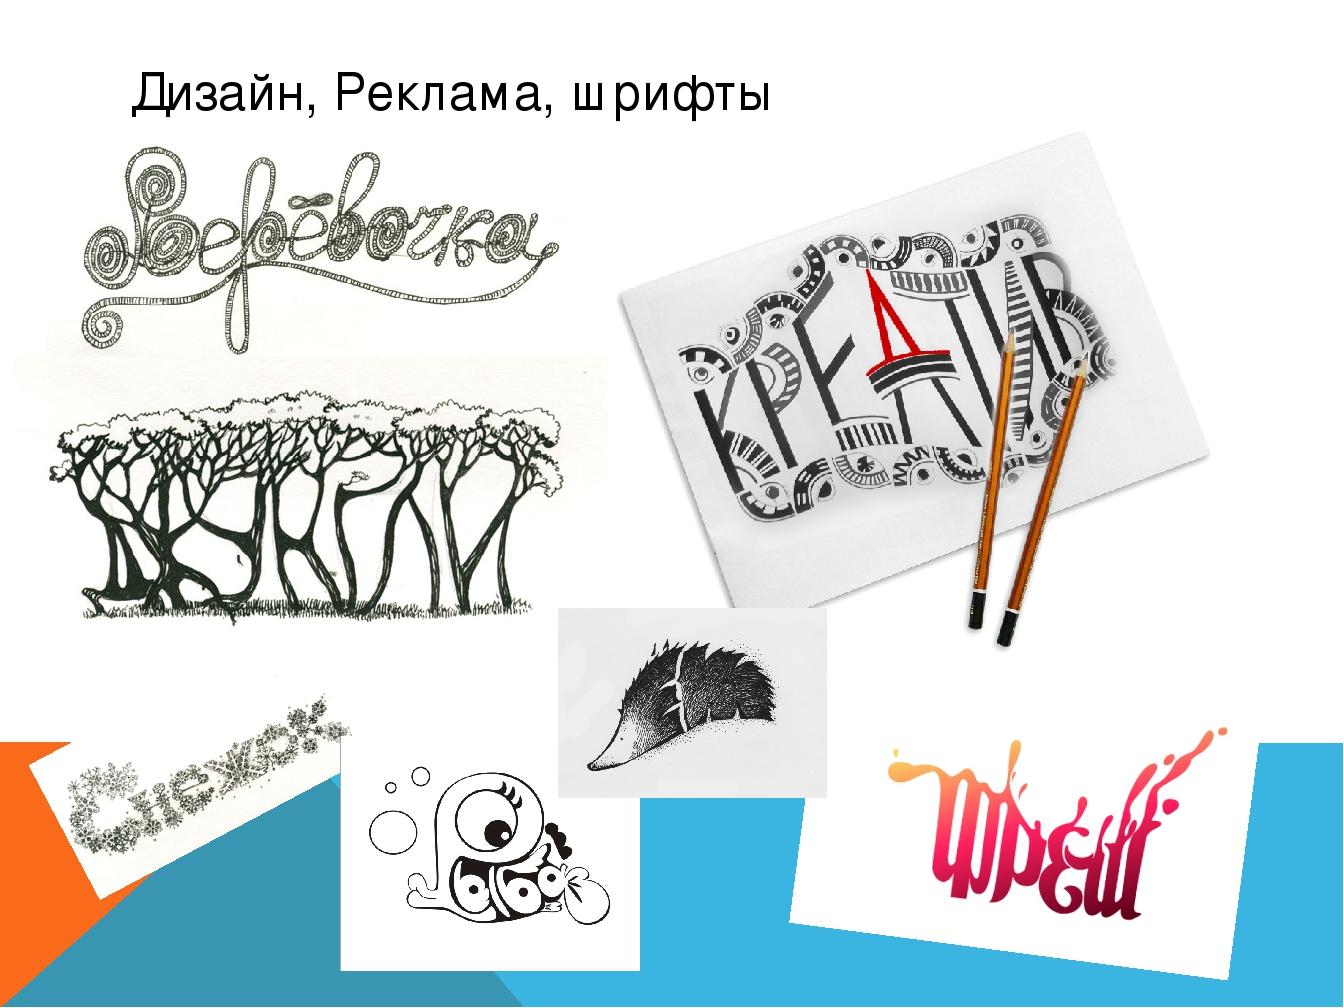 Дизайн, Реклама, шрифты